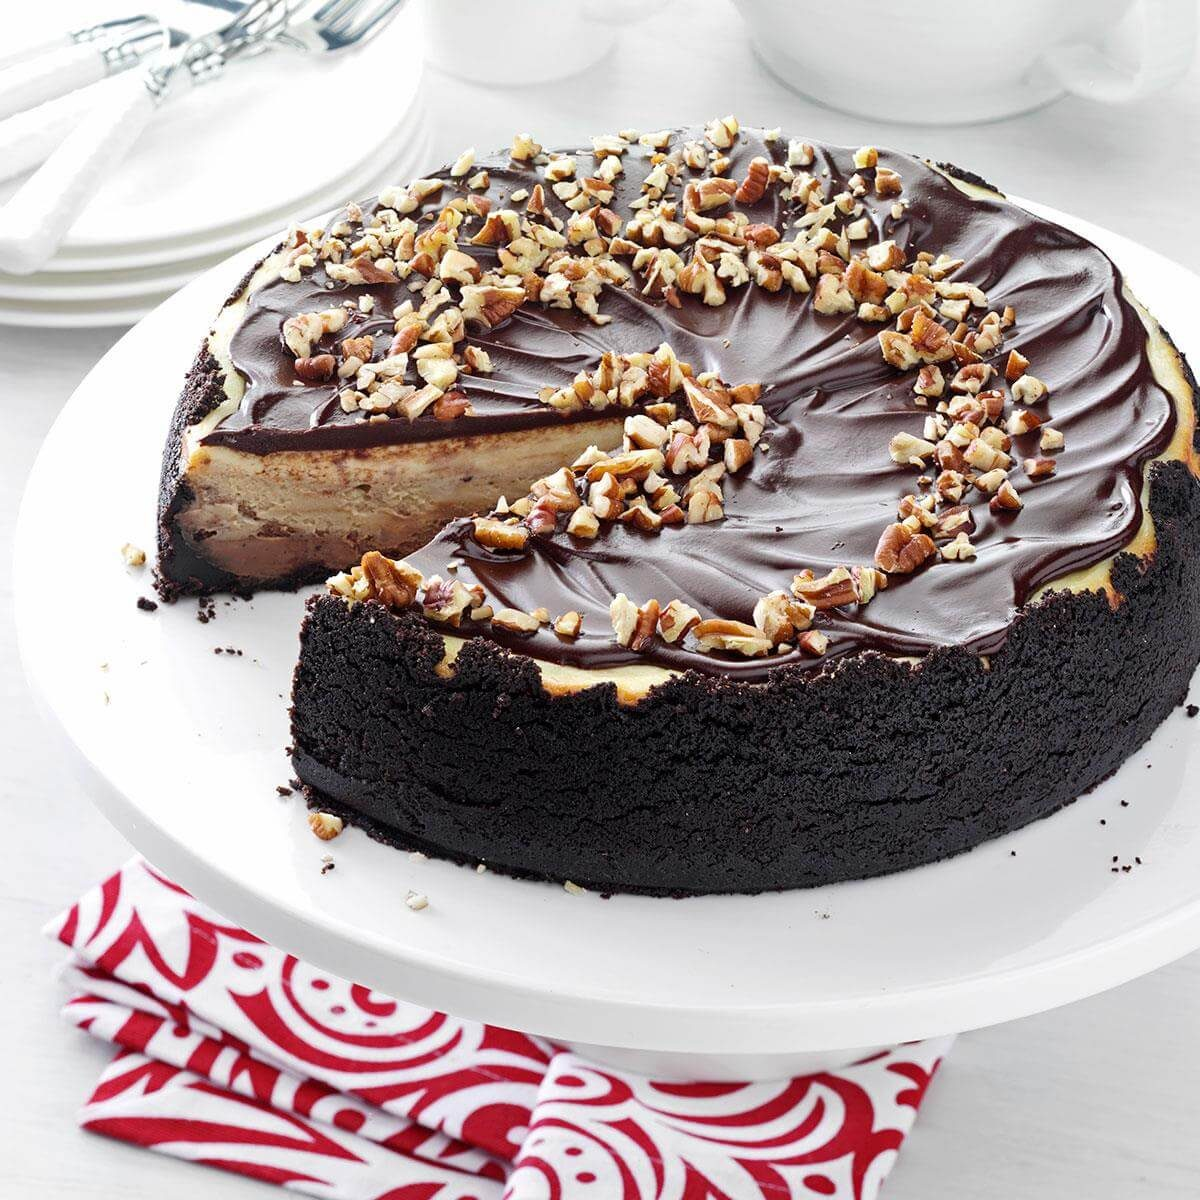 Chocolate Glazed Cheesecake Recipe